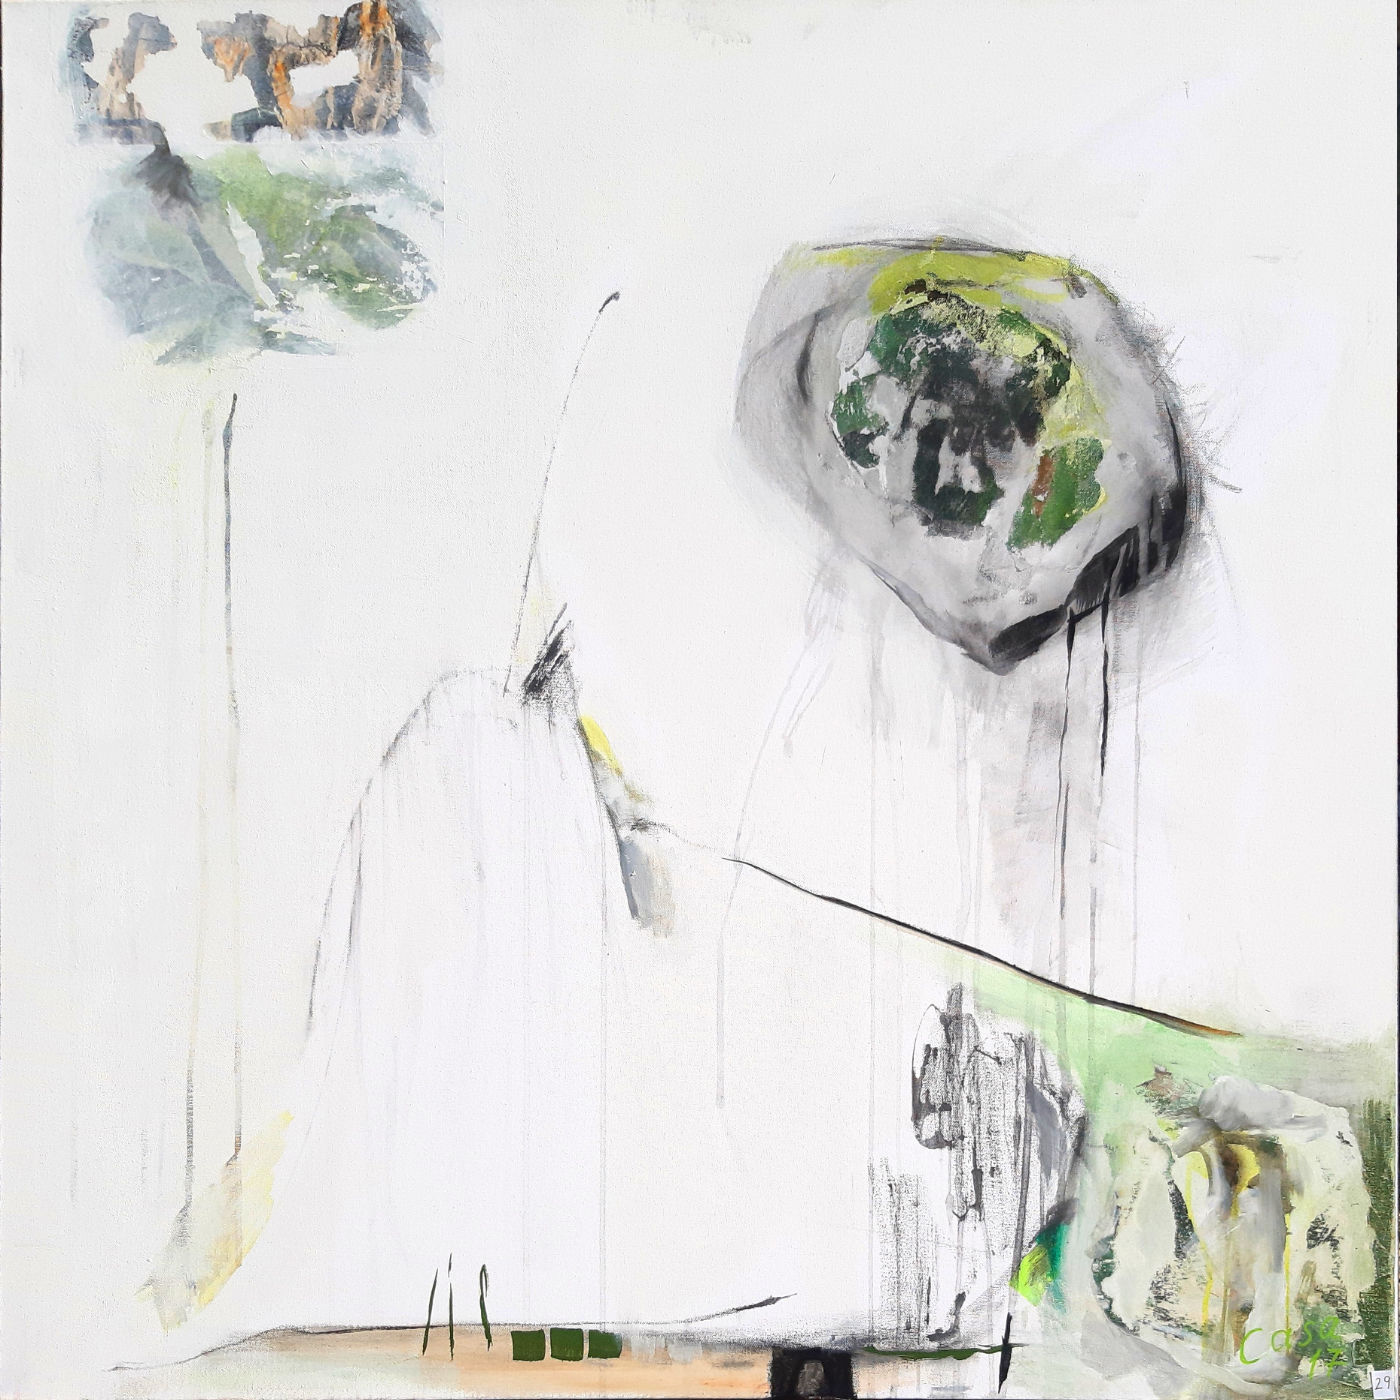 ohne Titel - Acryl, mixed media auf Leinwand, 100 x 100 cm